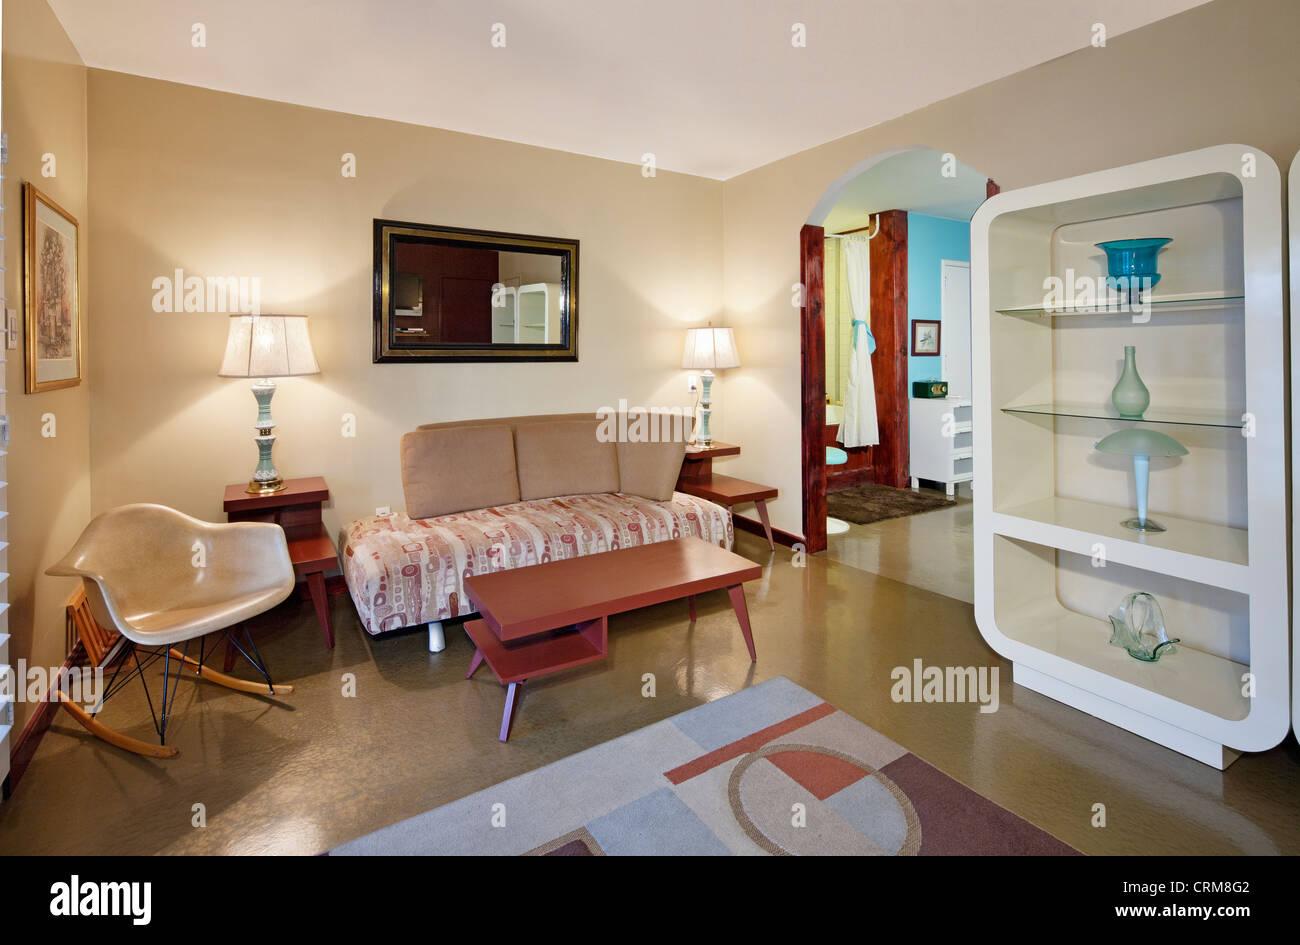 Living room interior design - Stock Image